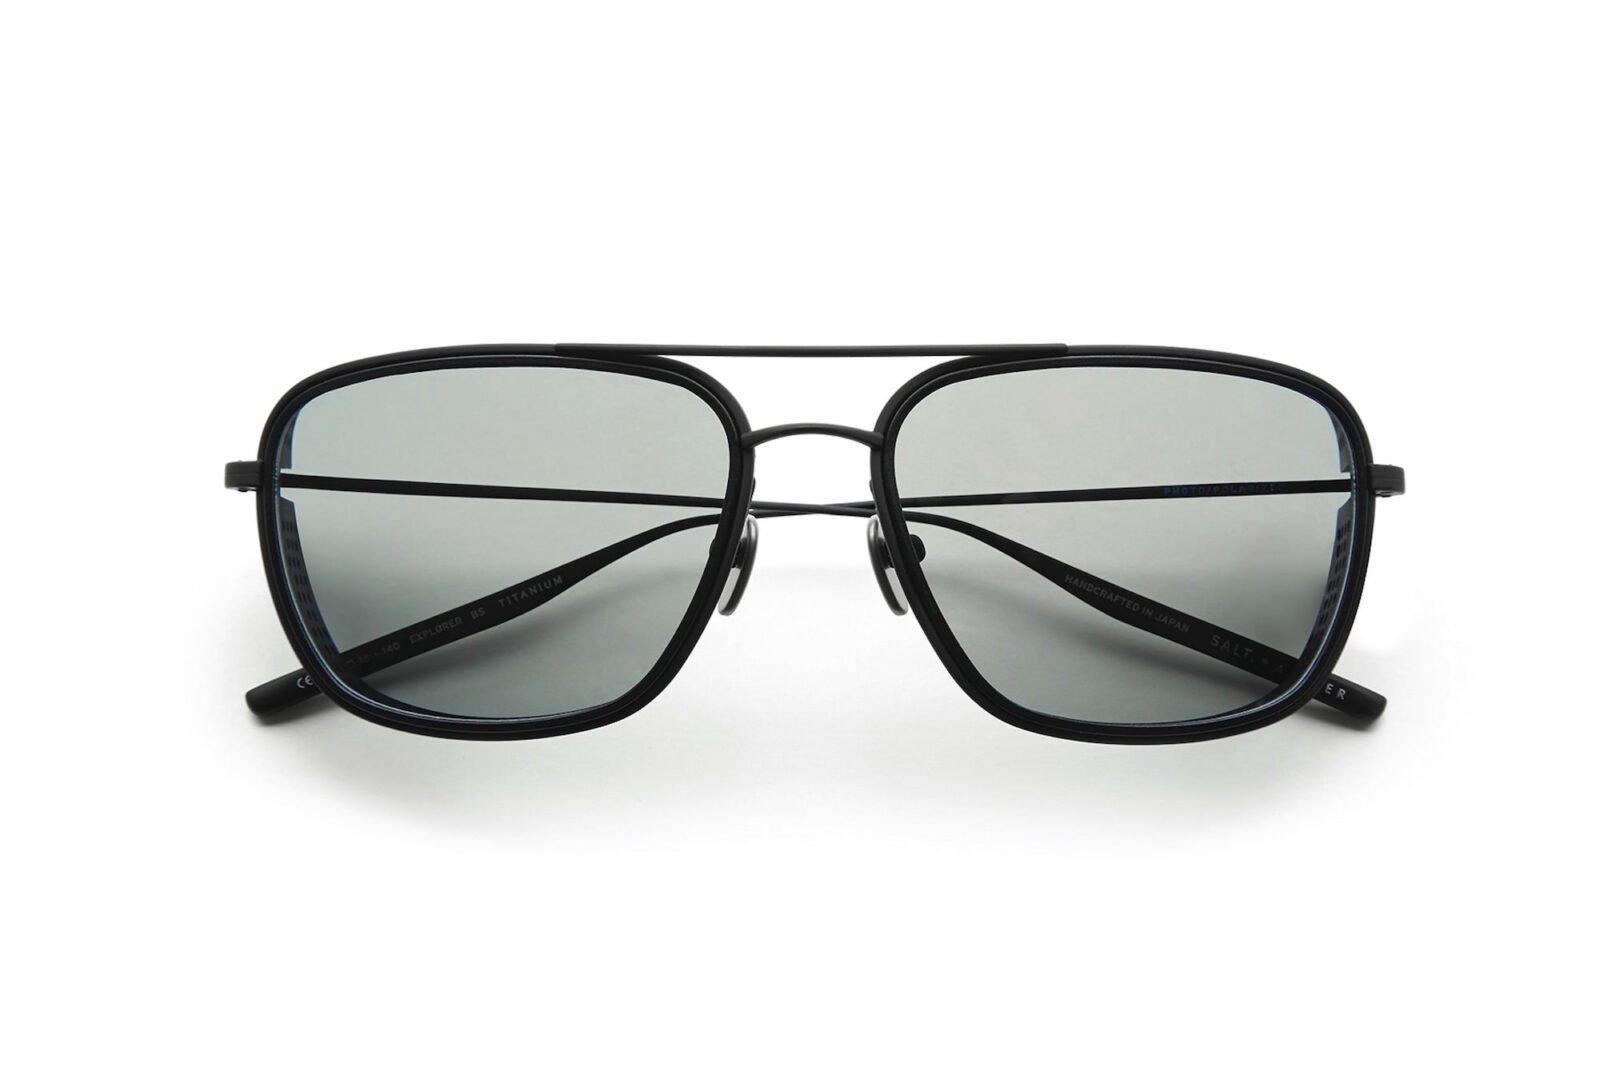 Aether Explorer Sunglasses